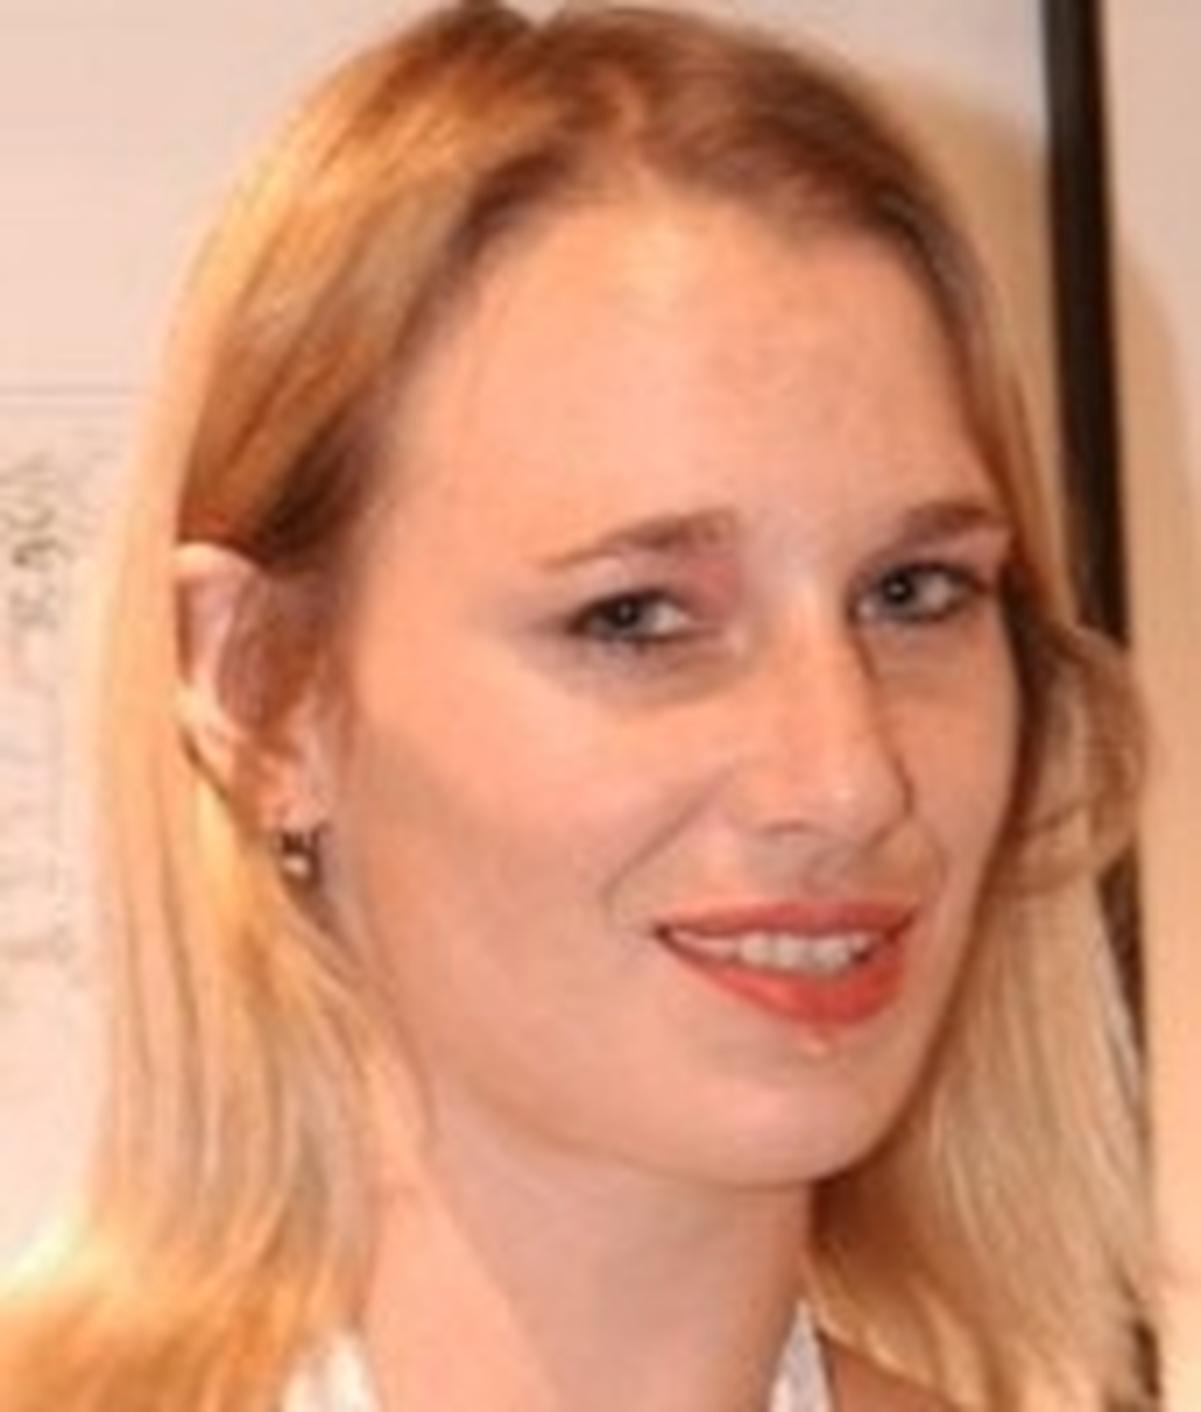 Actor Porno Moro joyce ellexa wiki & bio - pornographic actress